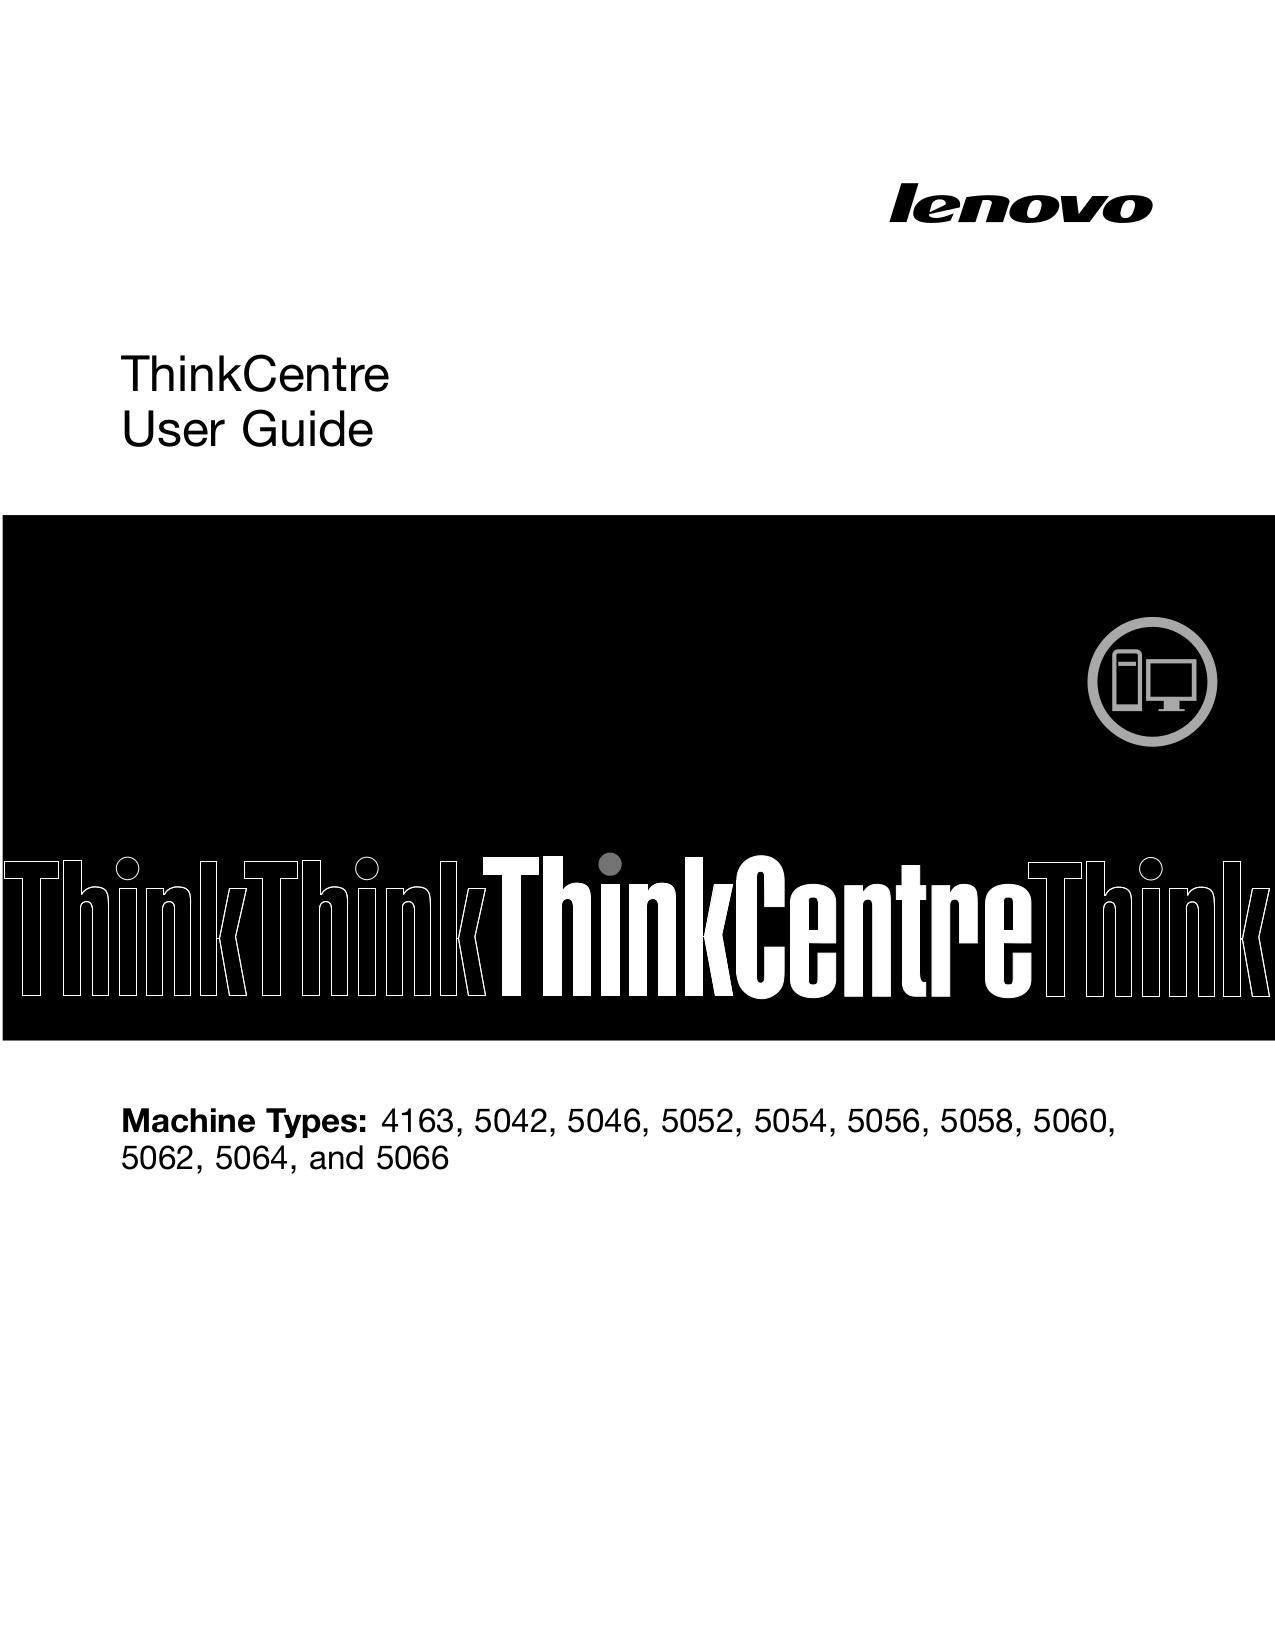 pdf for Lenovo Desktop ThinkCentre M75e 5054 manual